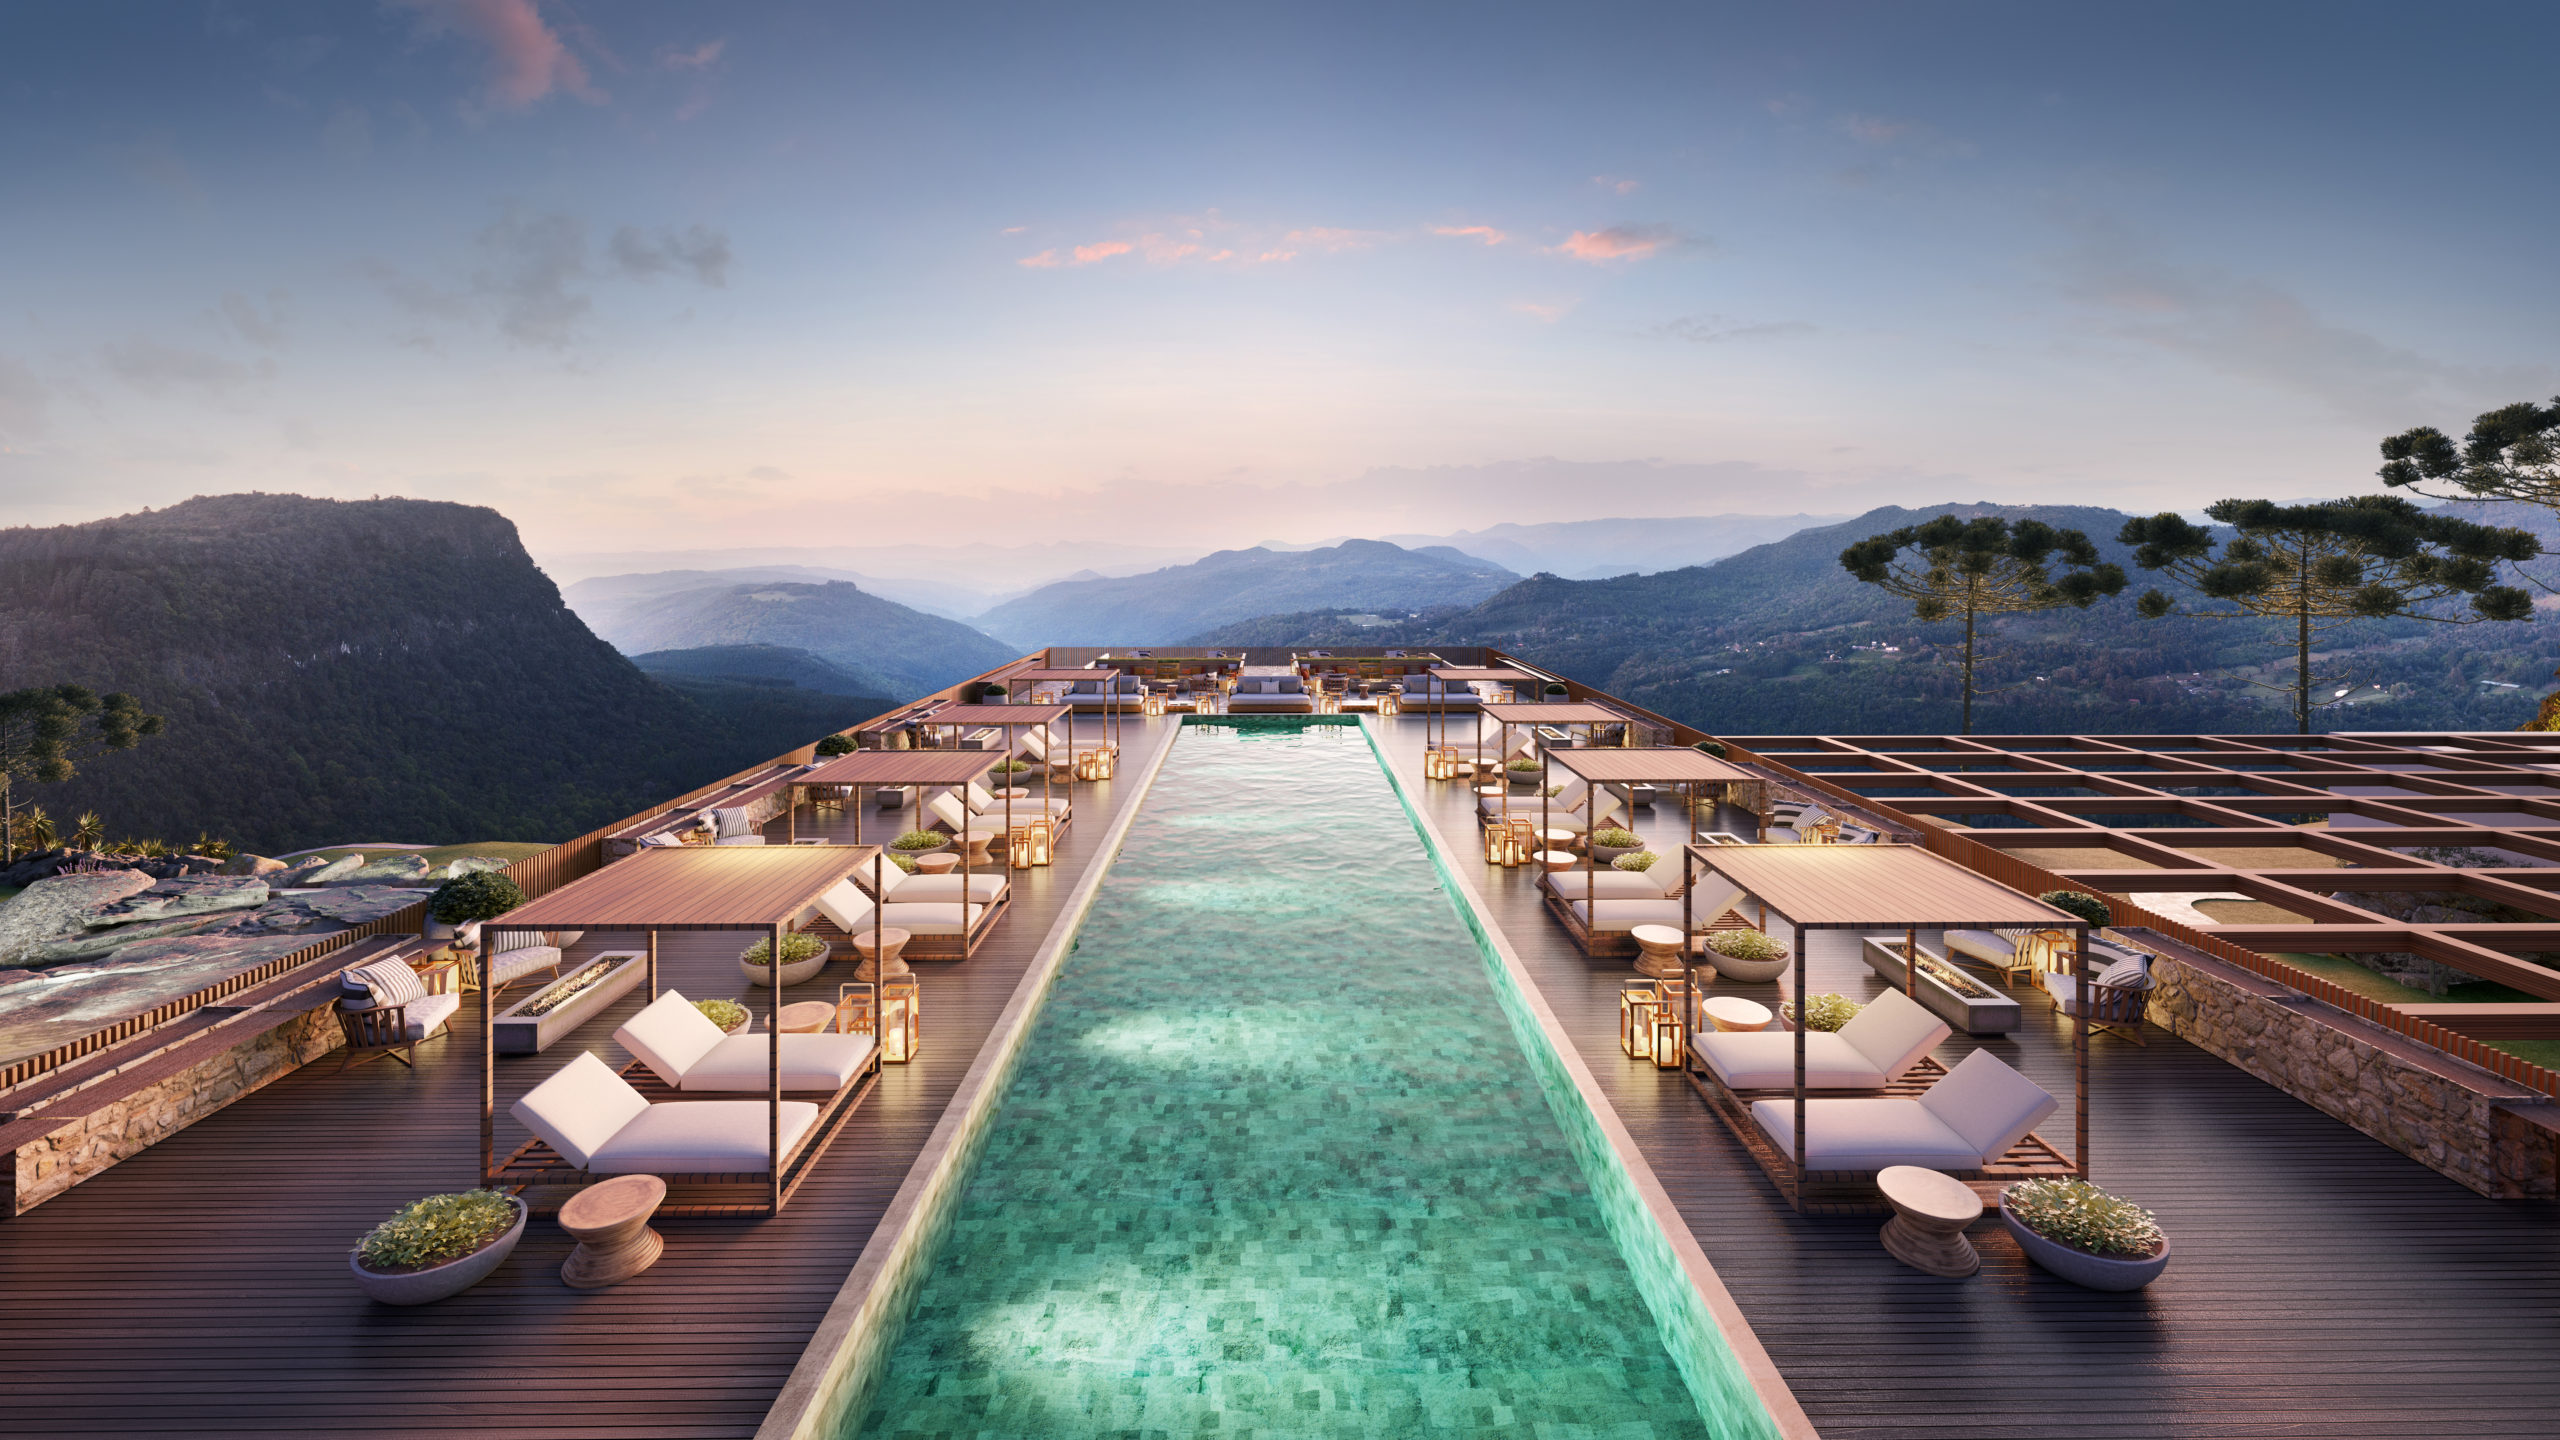 Kempinski Laje de Pedra Hotel & Residences